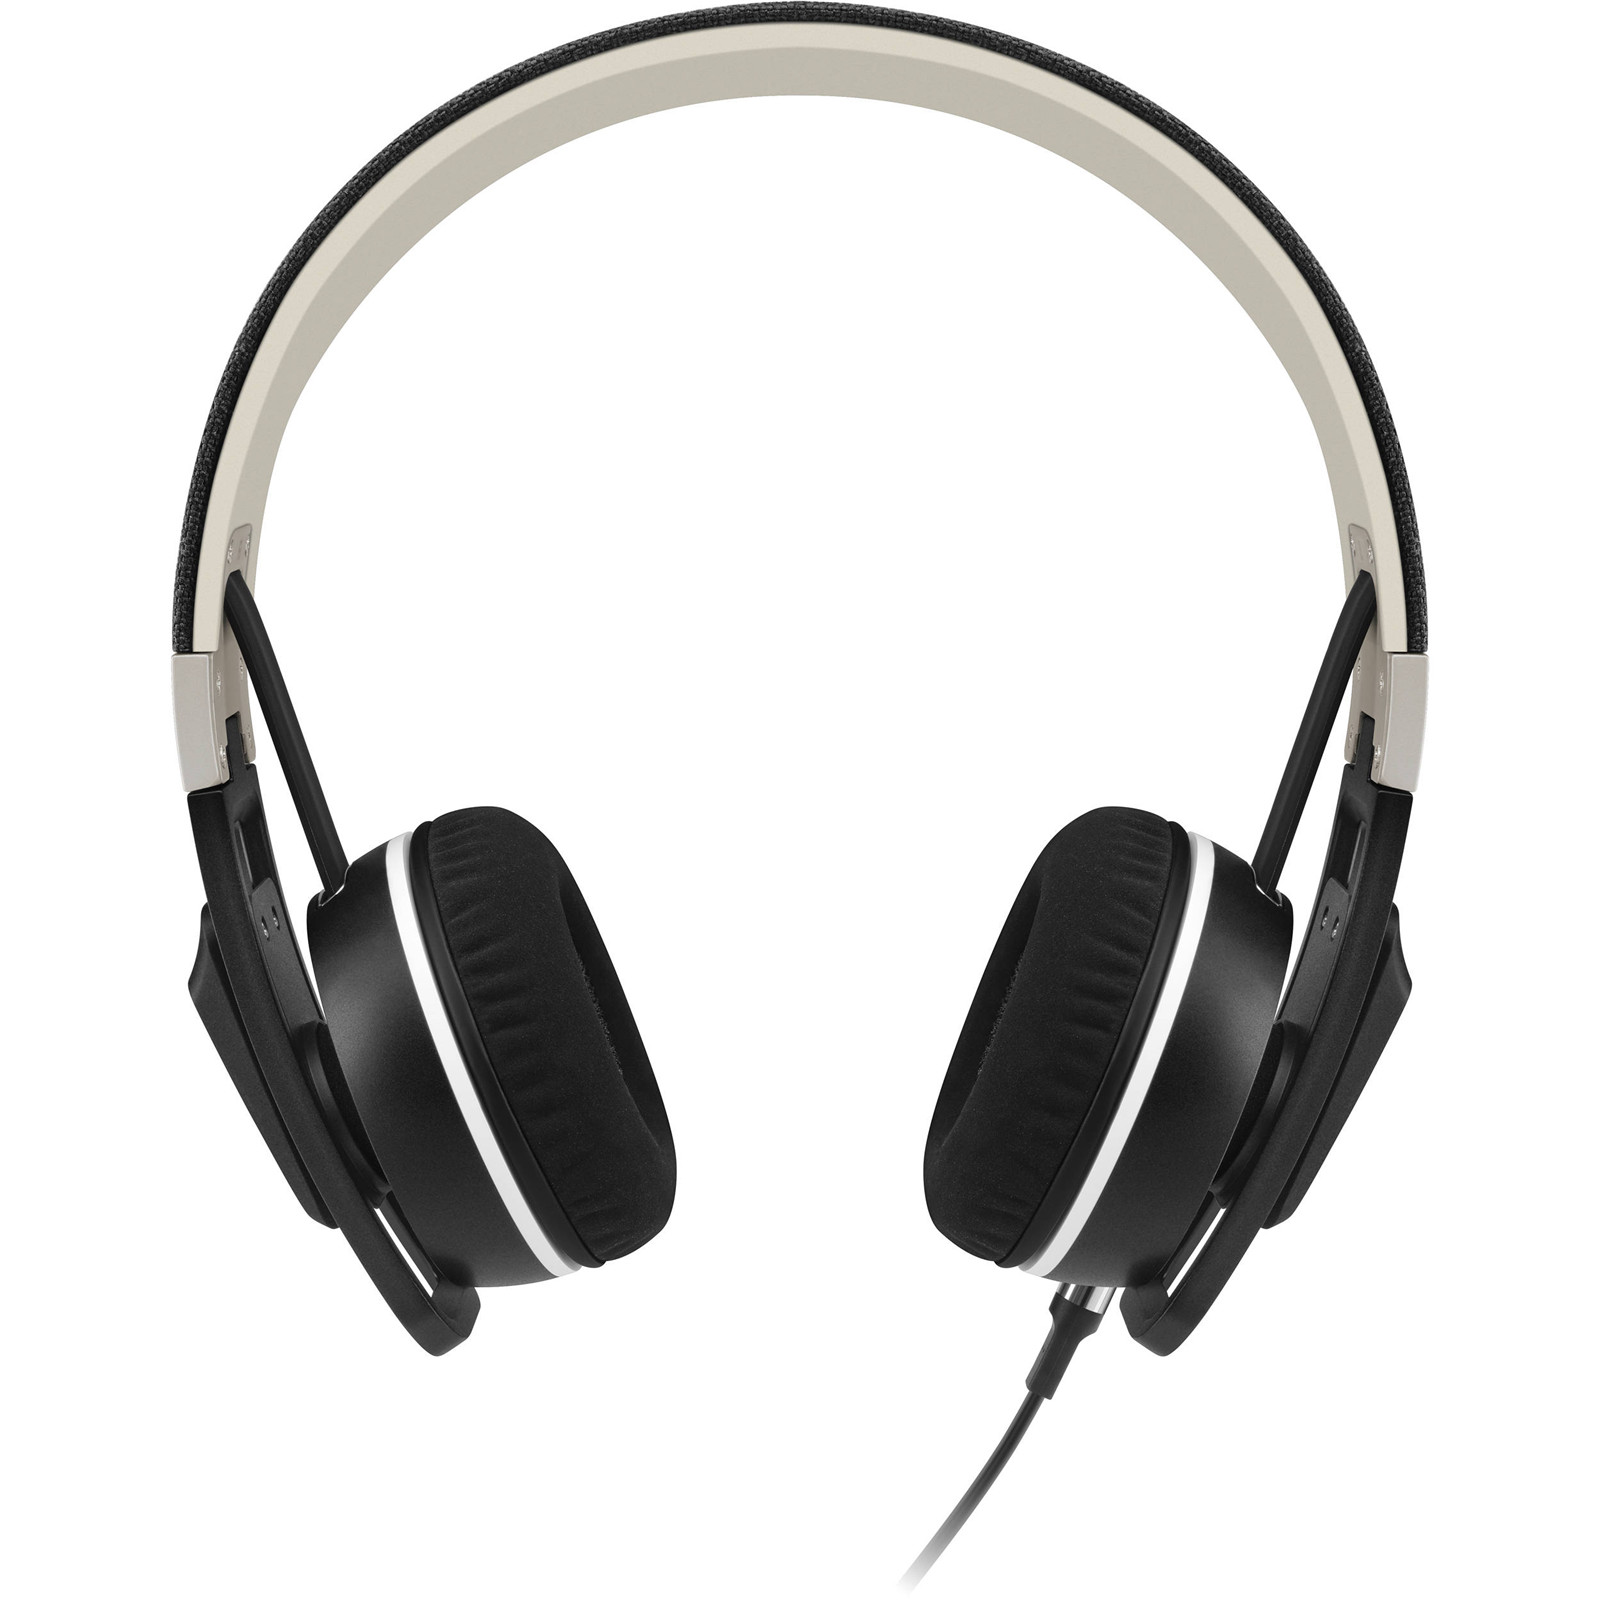 ba750a29614 Sennheiser Urbanite I On-Ear Headphones - Black - with in-line controls for  Apple iOS devices